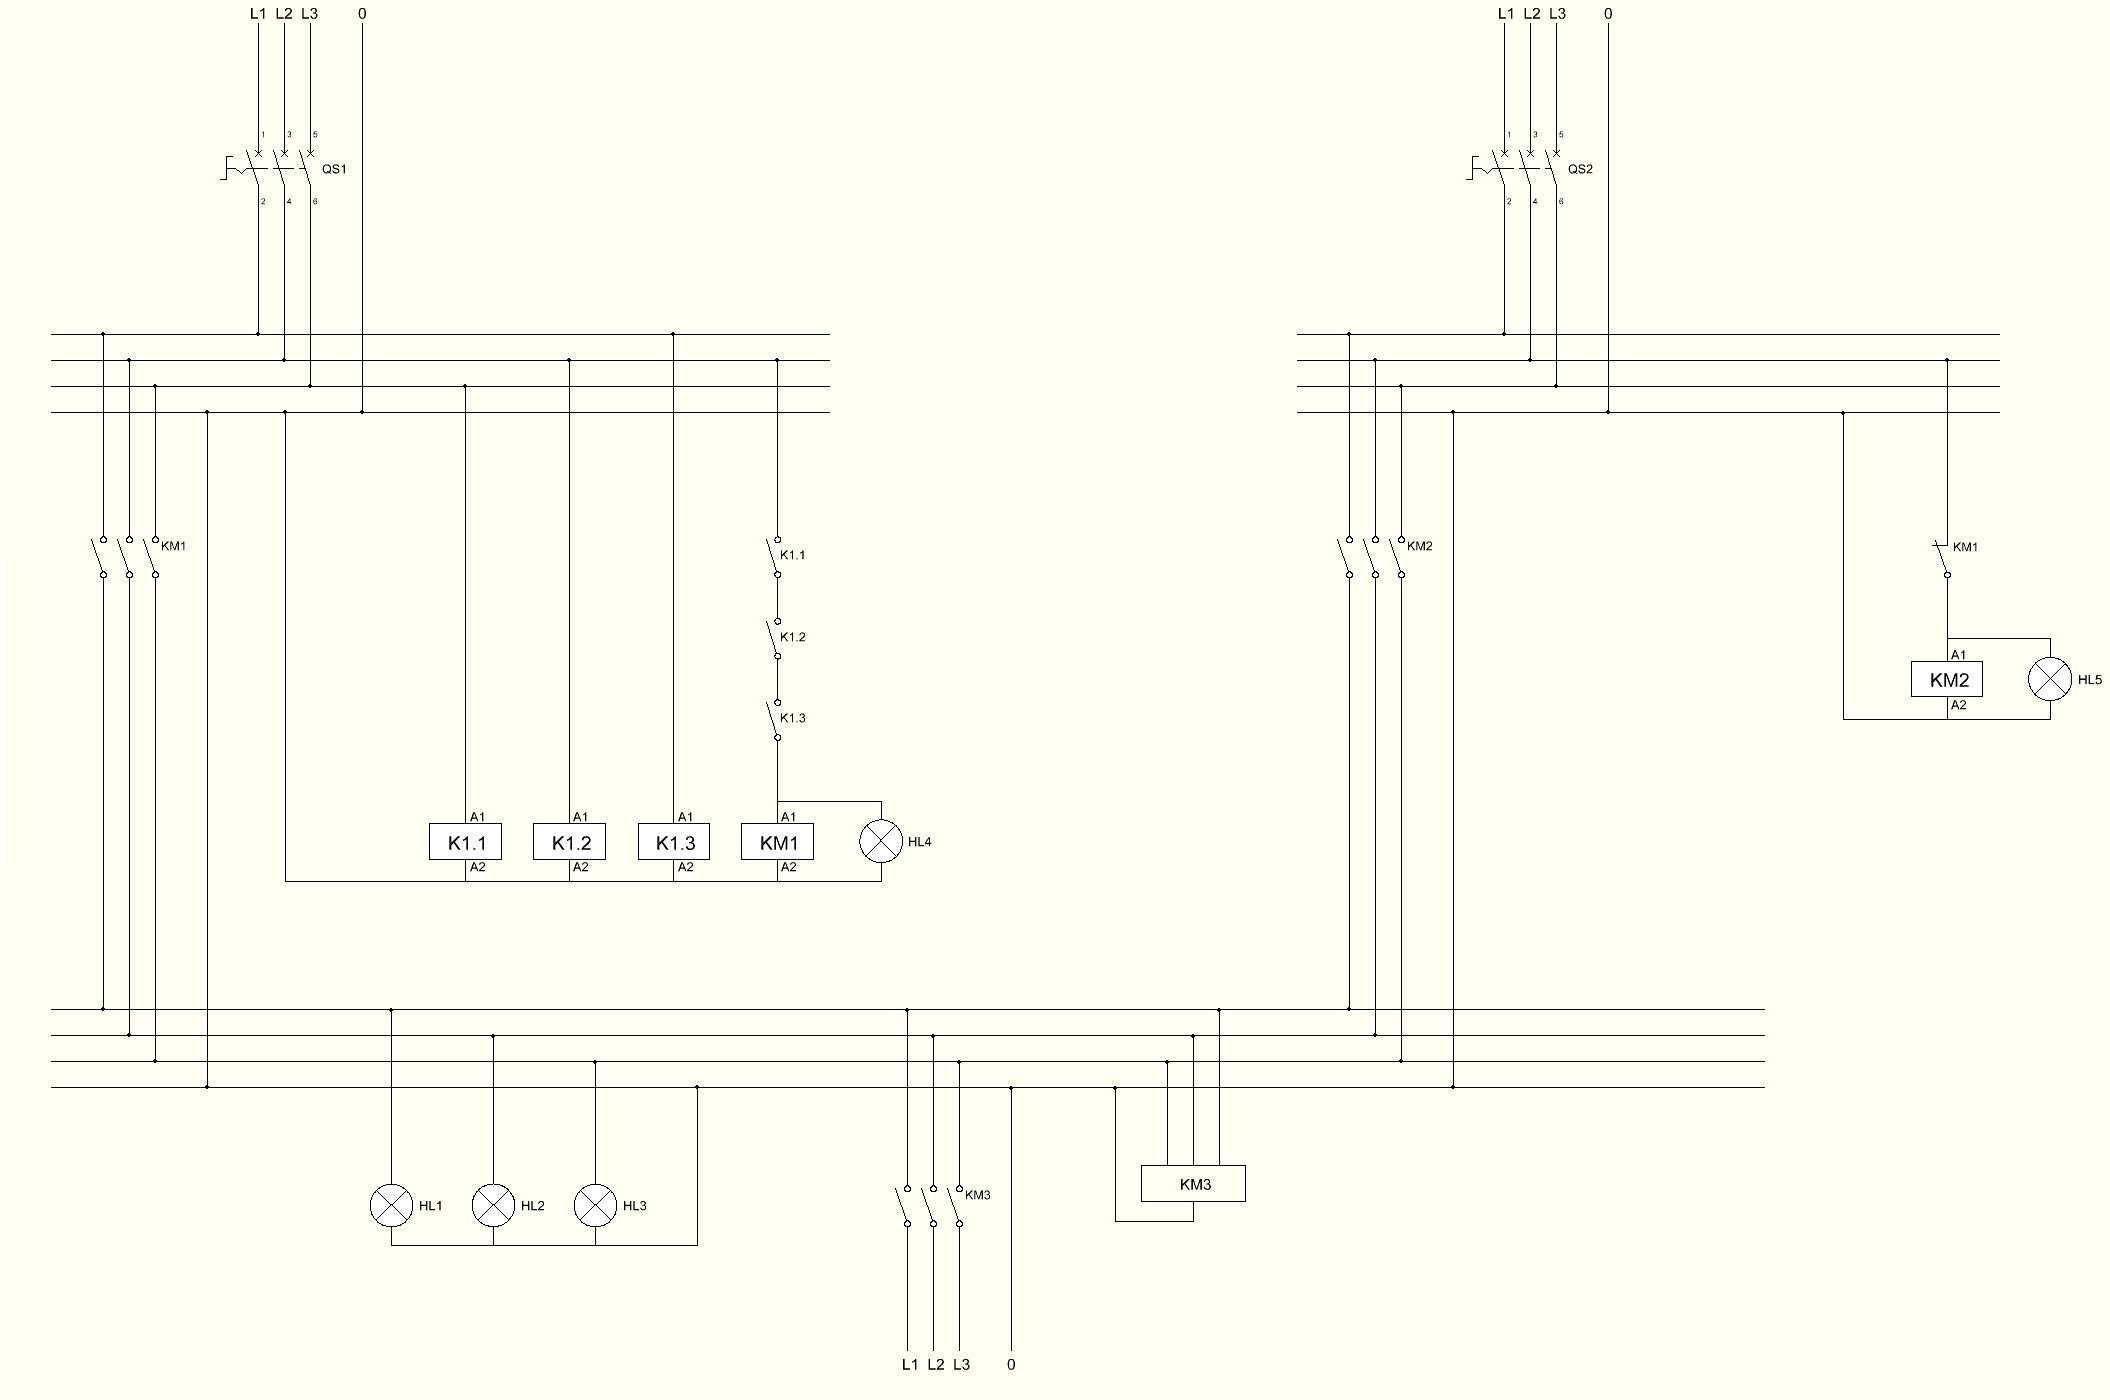 XC_9206] Automatic Transfer Switch Wiring Diagram Free DiagramUmng Usly Targ Weasi Intel Monoc Iosco Bemua Mohammedshrine Librar Wiring  101